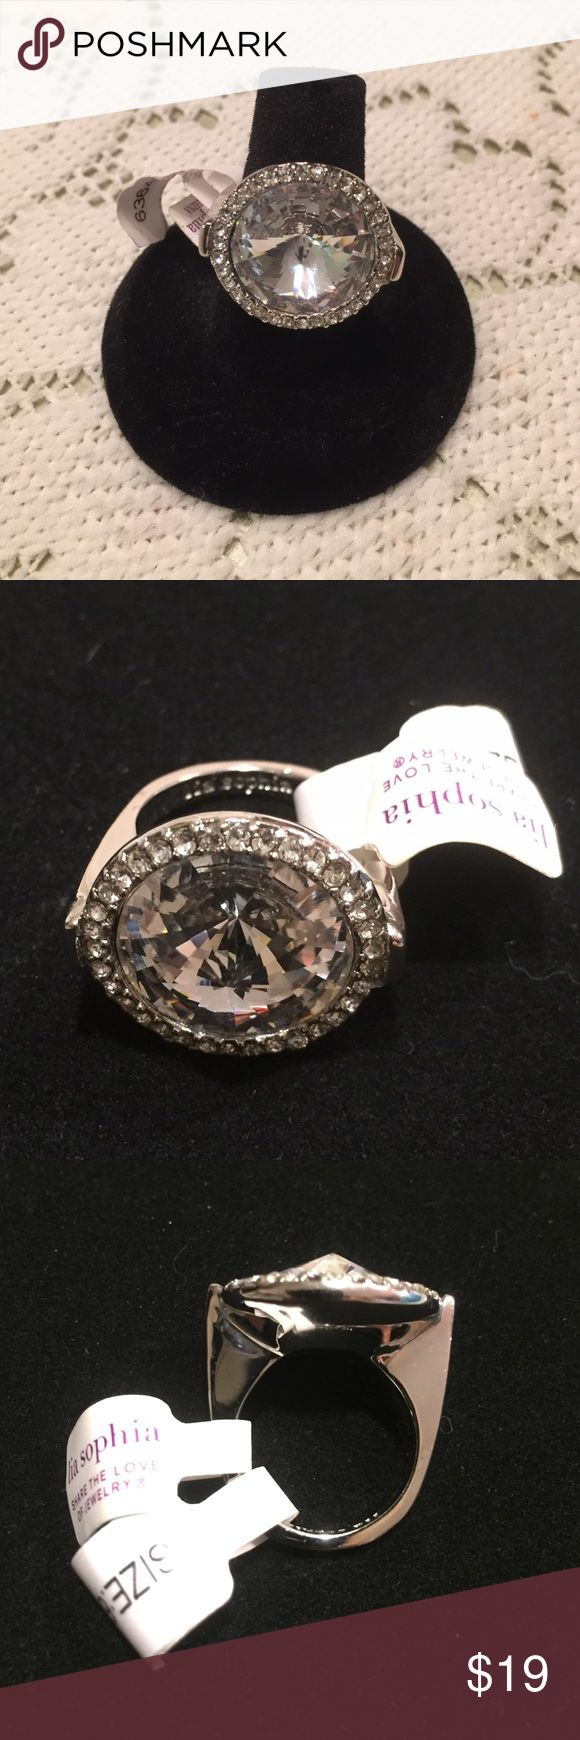 Lia Sophia✨Ring Silver tone ring. Large round stone. Lia Sophia Jewelry Rings